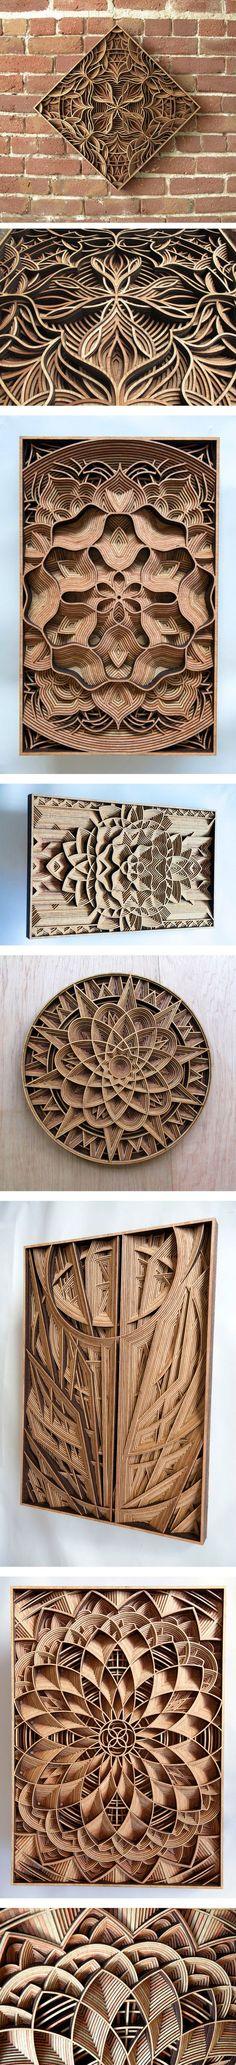 Geometric Laser-Cut Wood Relief Sculptures by Gabriel Schama: